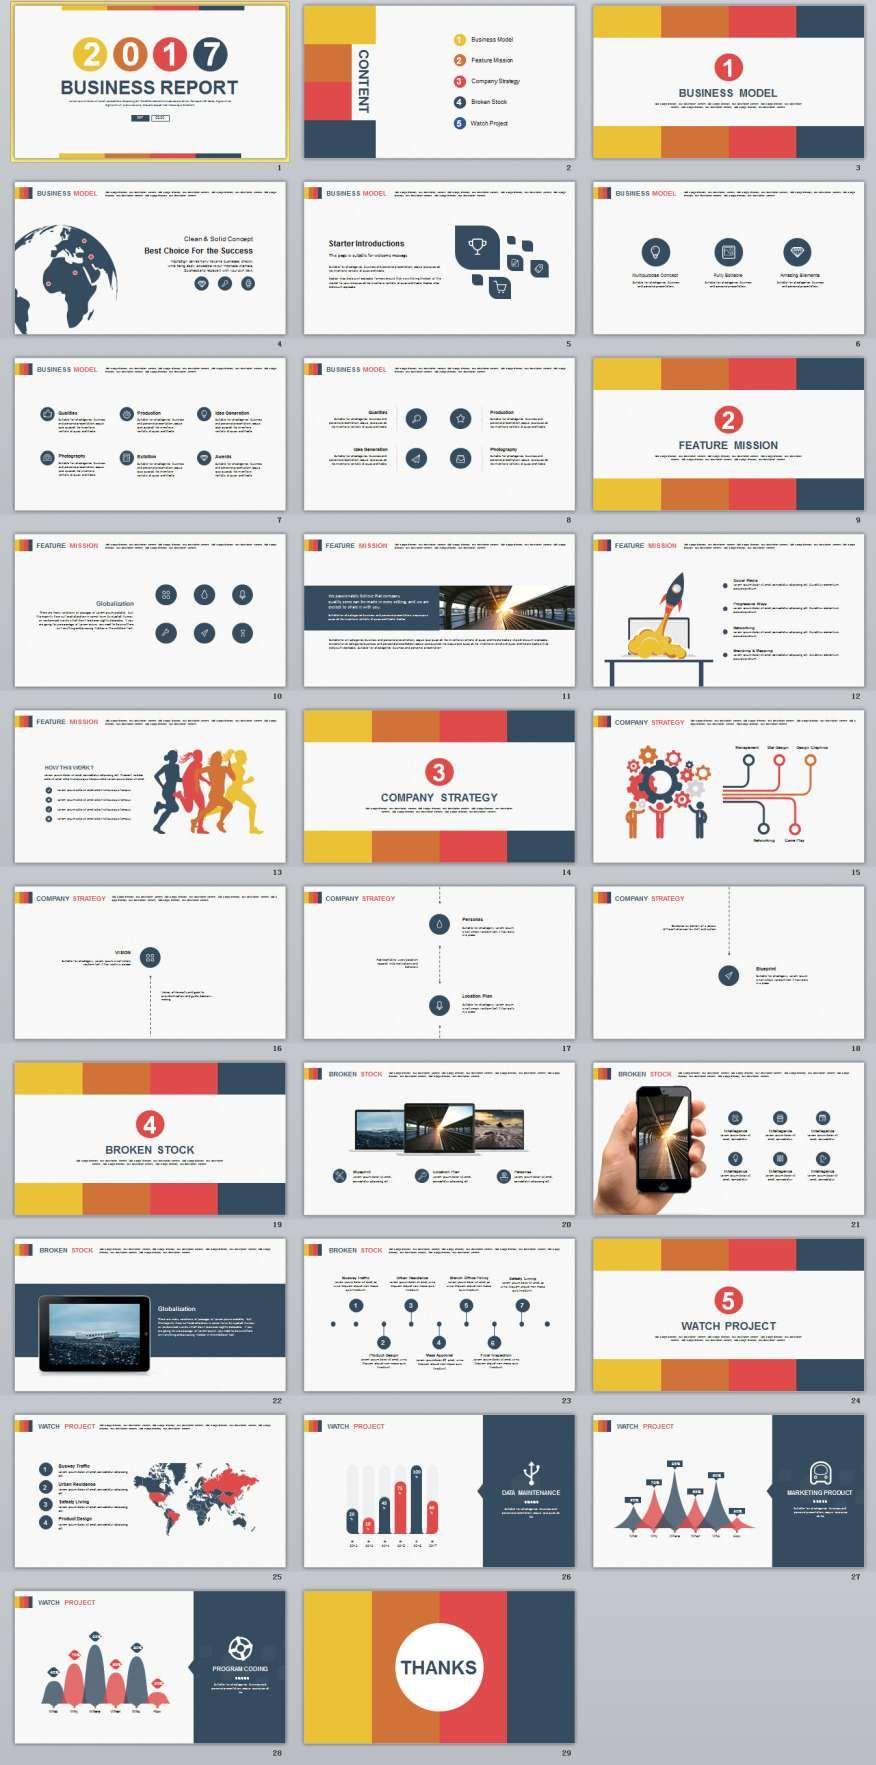 29 business vision design powerpoint templates 2018 business 29 business vision design powerpoint templates toneelgroepblik Choice Image